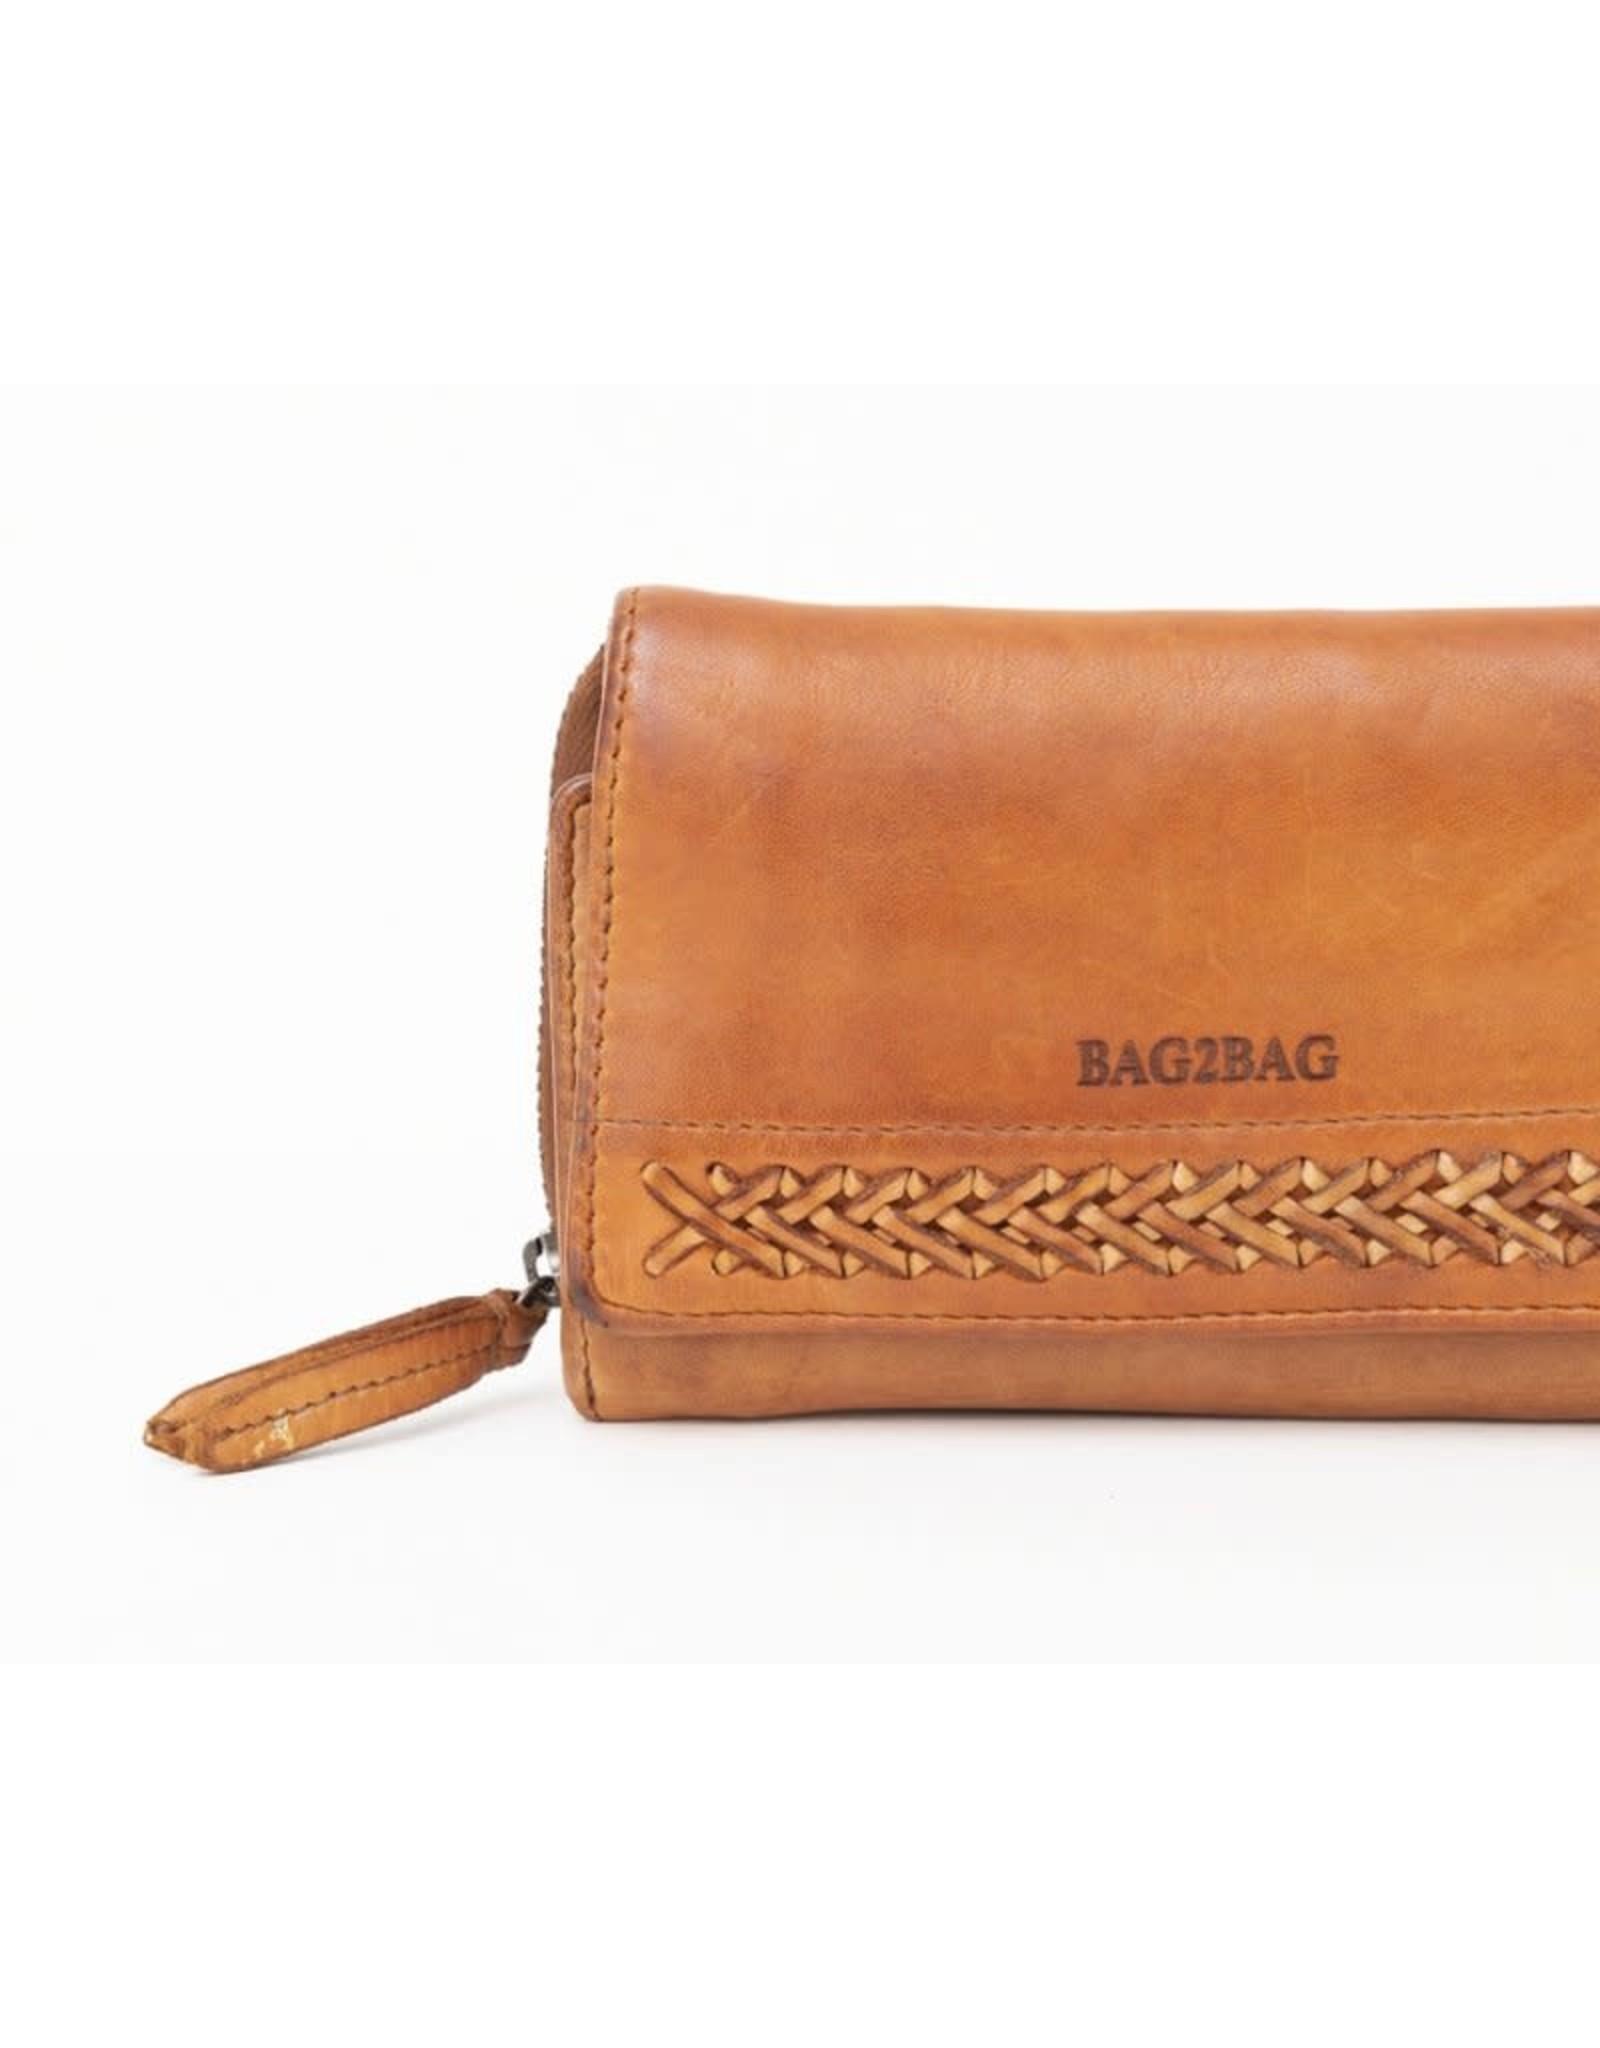 Bag2Bag Bag2Bag Matera